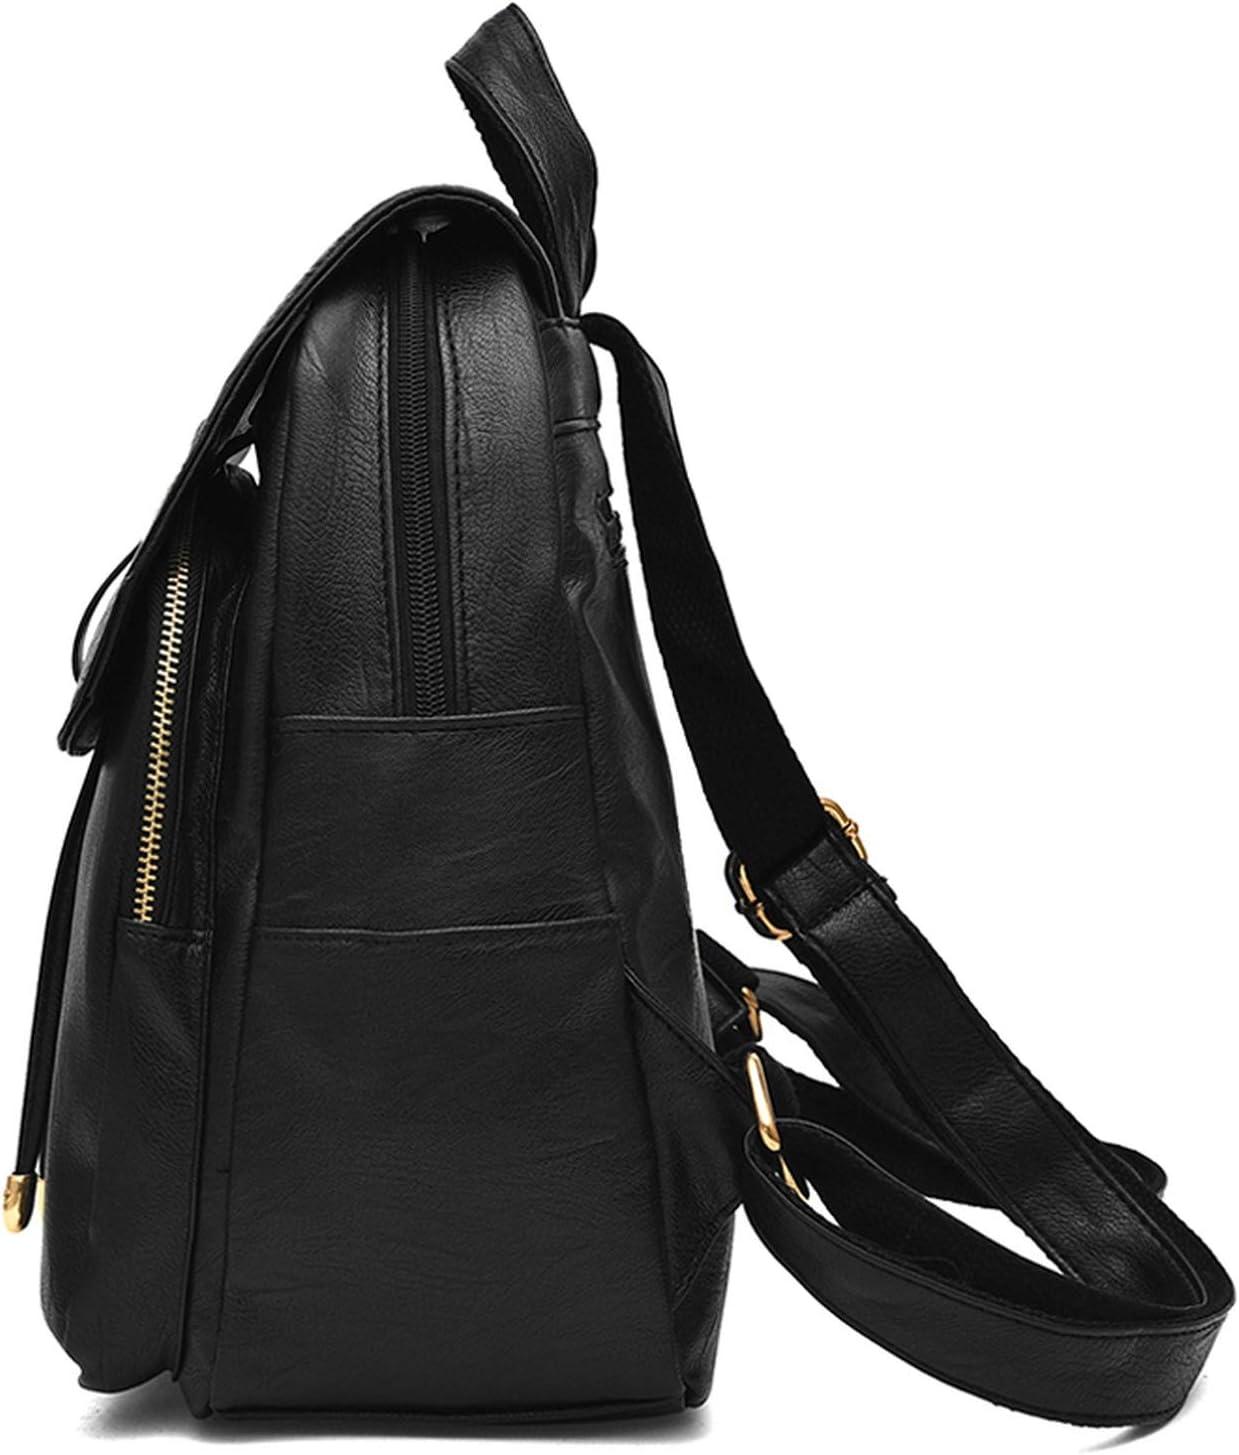 Zipper Tassel Large Capacity Women Backpack PU Leather Travel Shoulder Bag Purse Girl School Bag,Winered